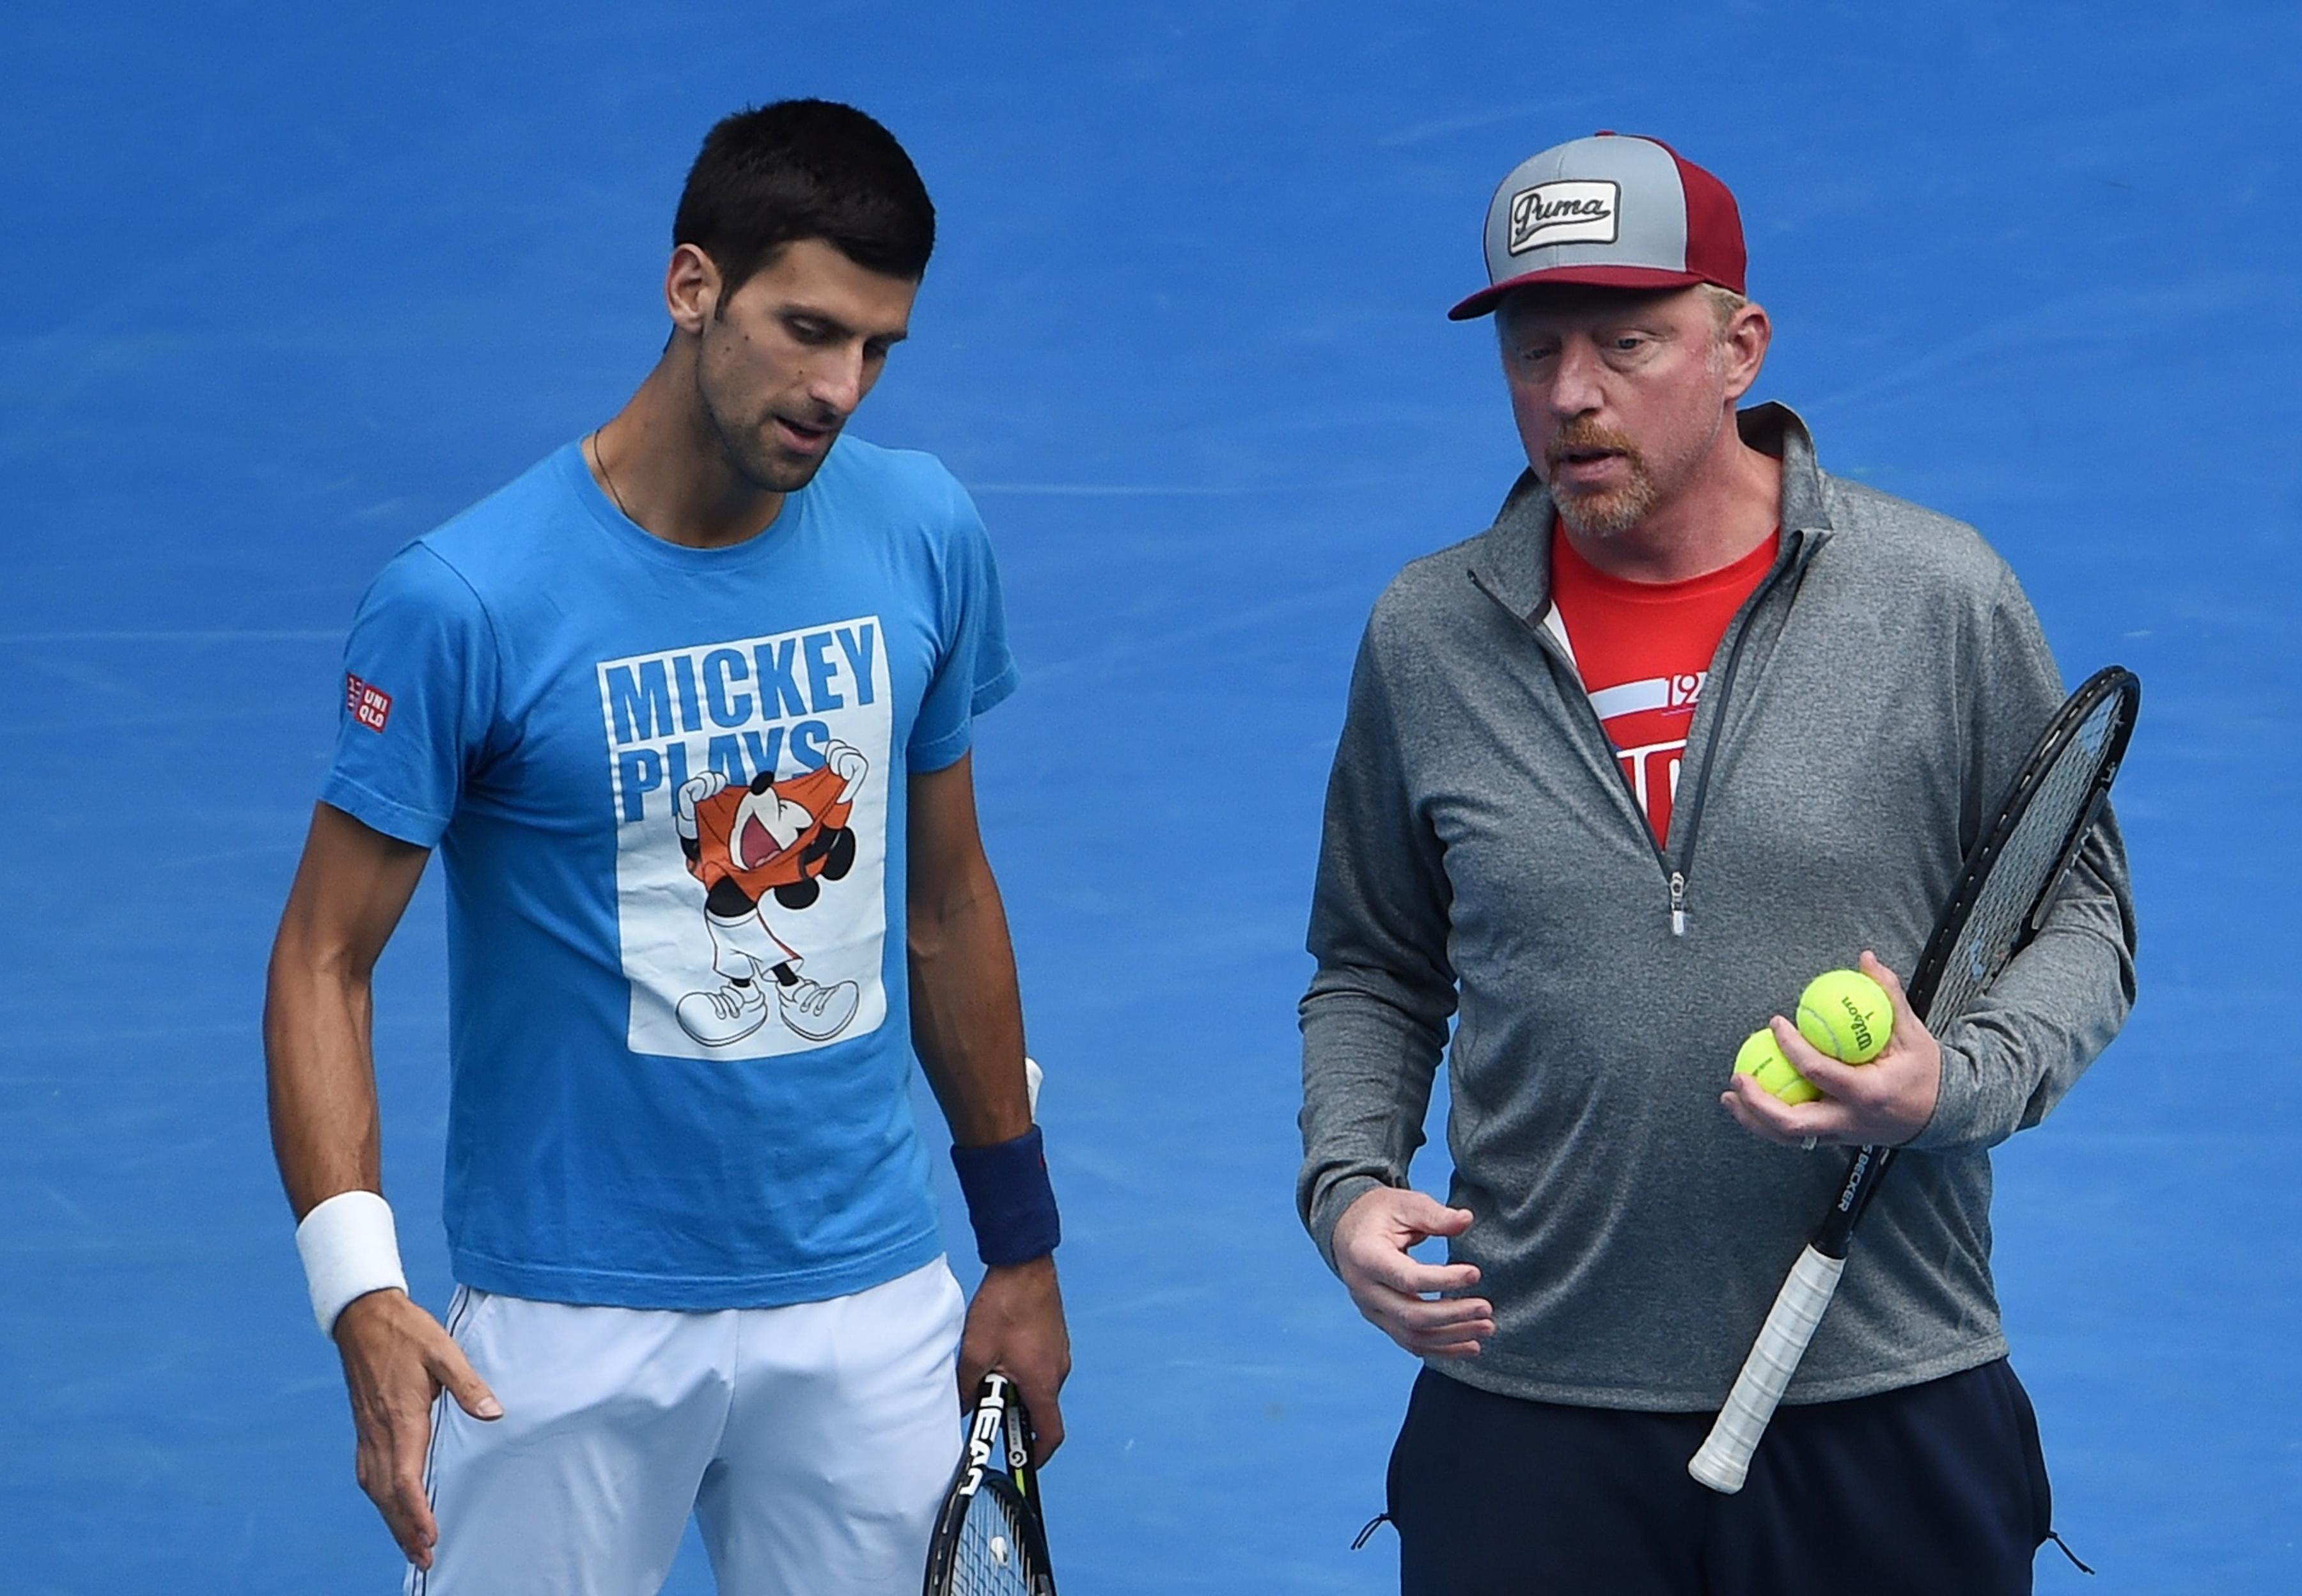 Boris Becker: Novak Djokovic's lack of focus after winning French Open caused split